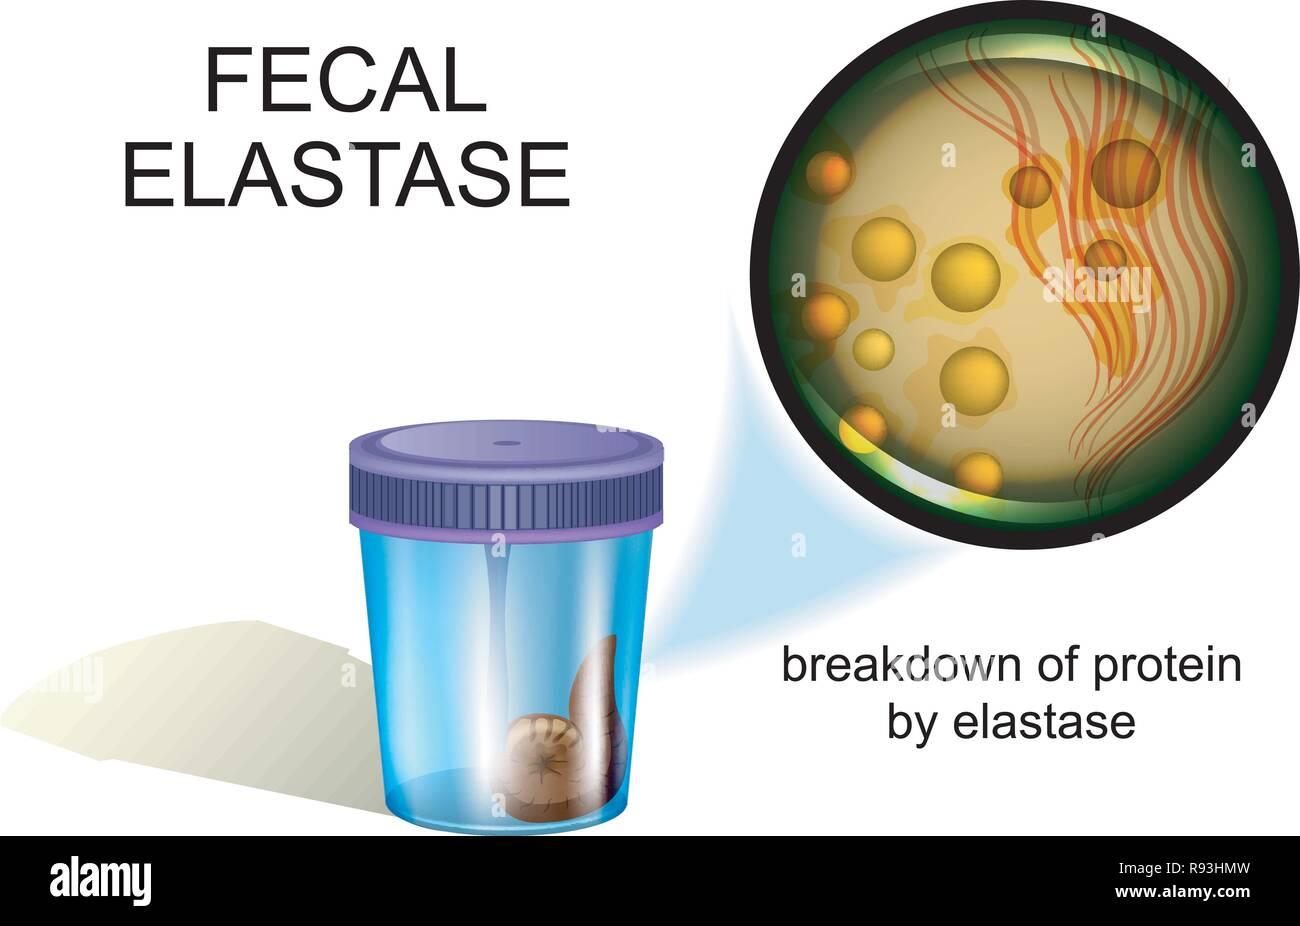 vector illustration of a fecal elastase test, coprology - Stock Vector